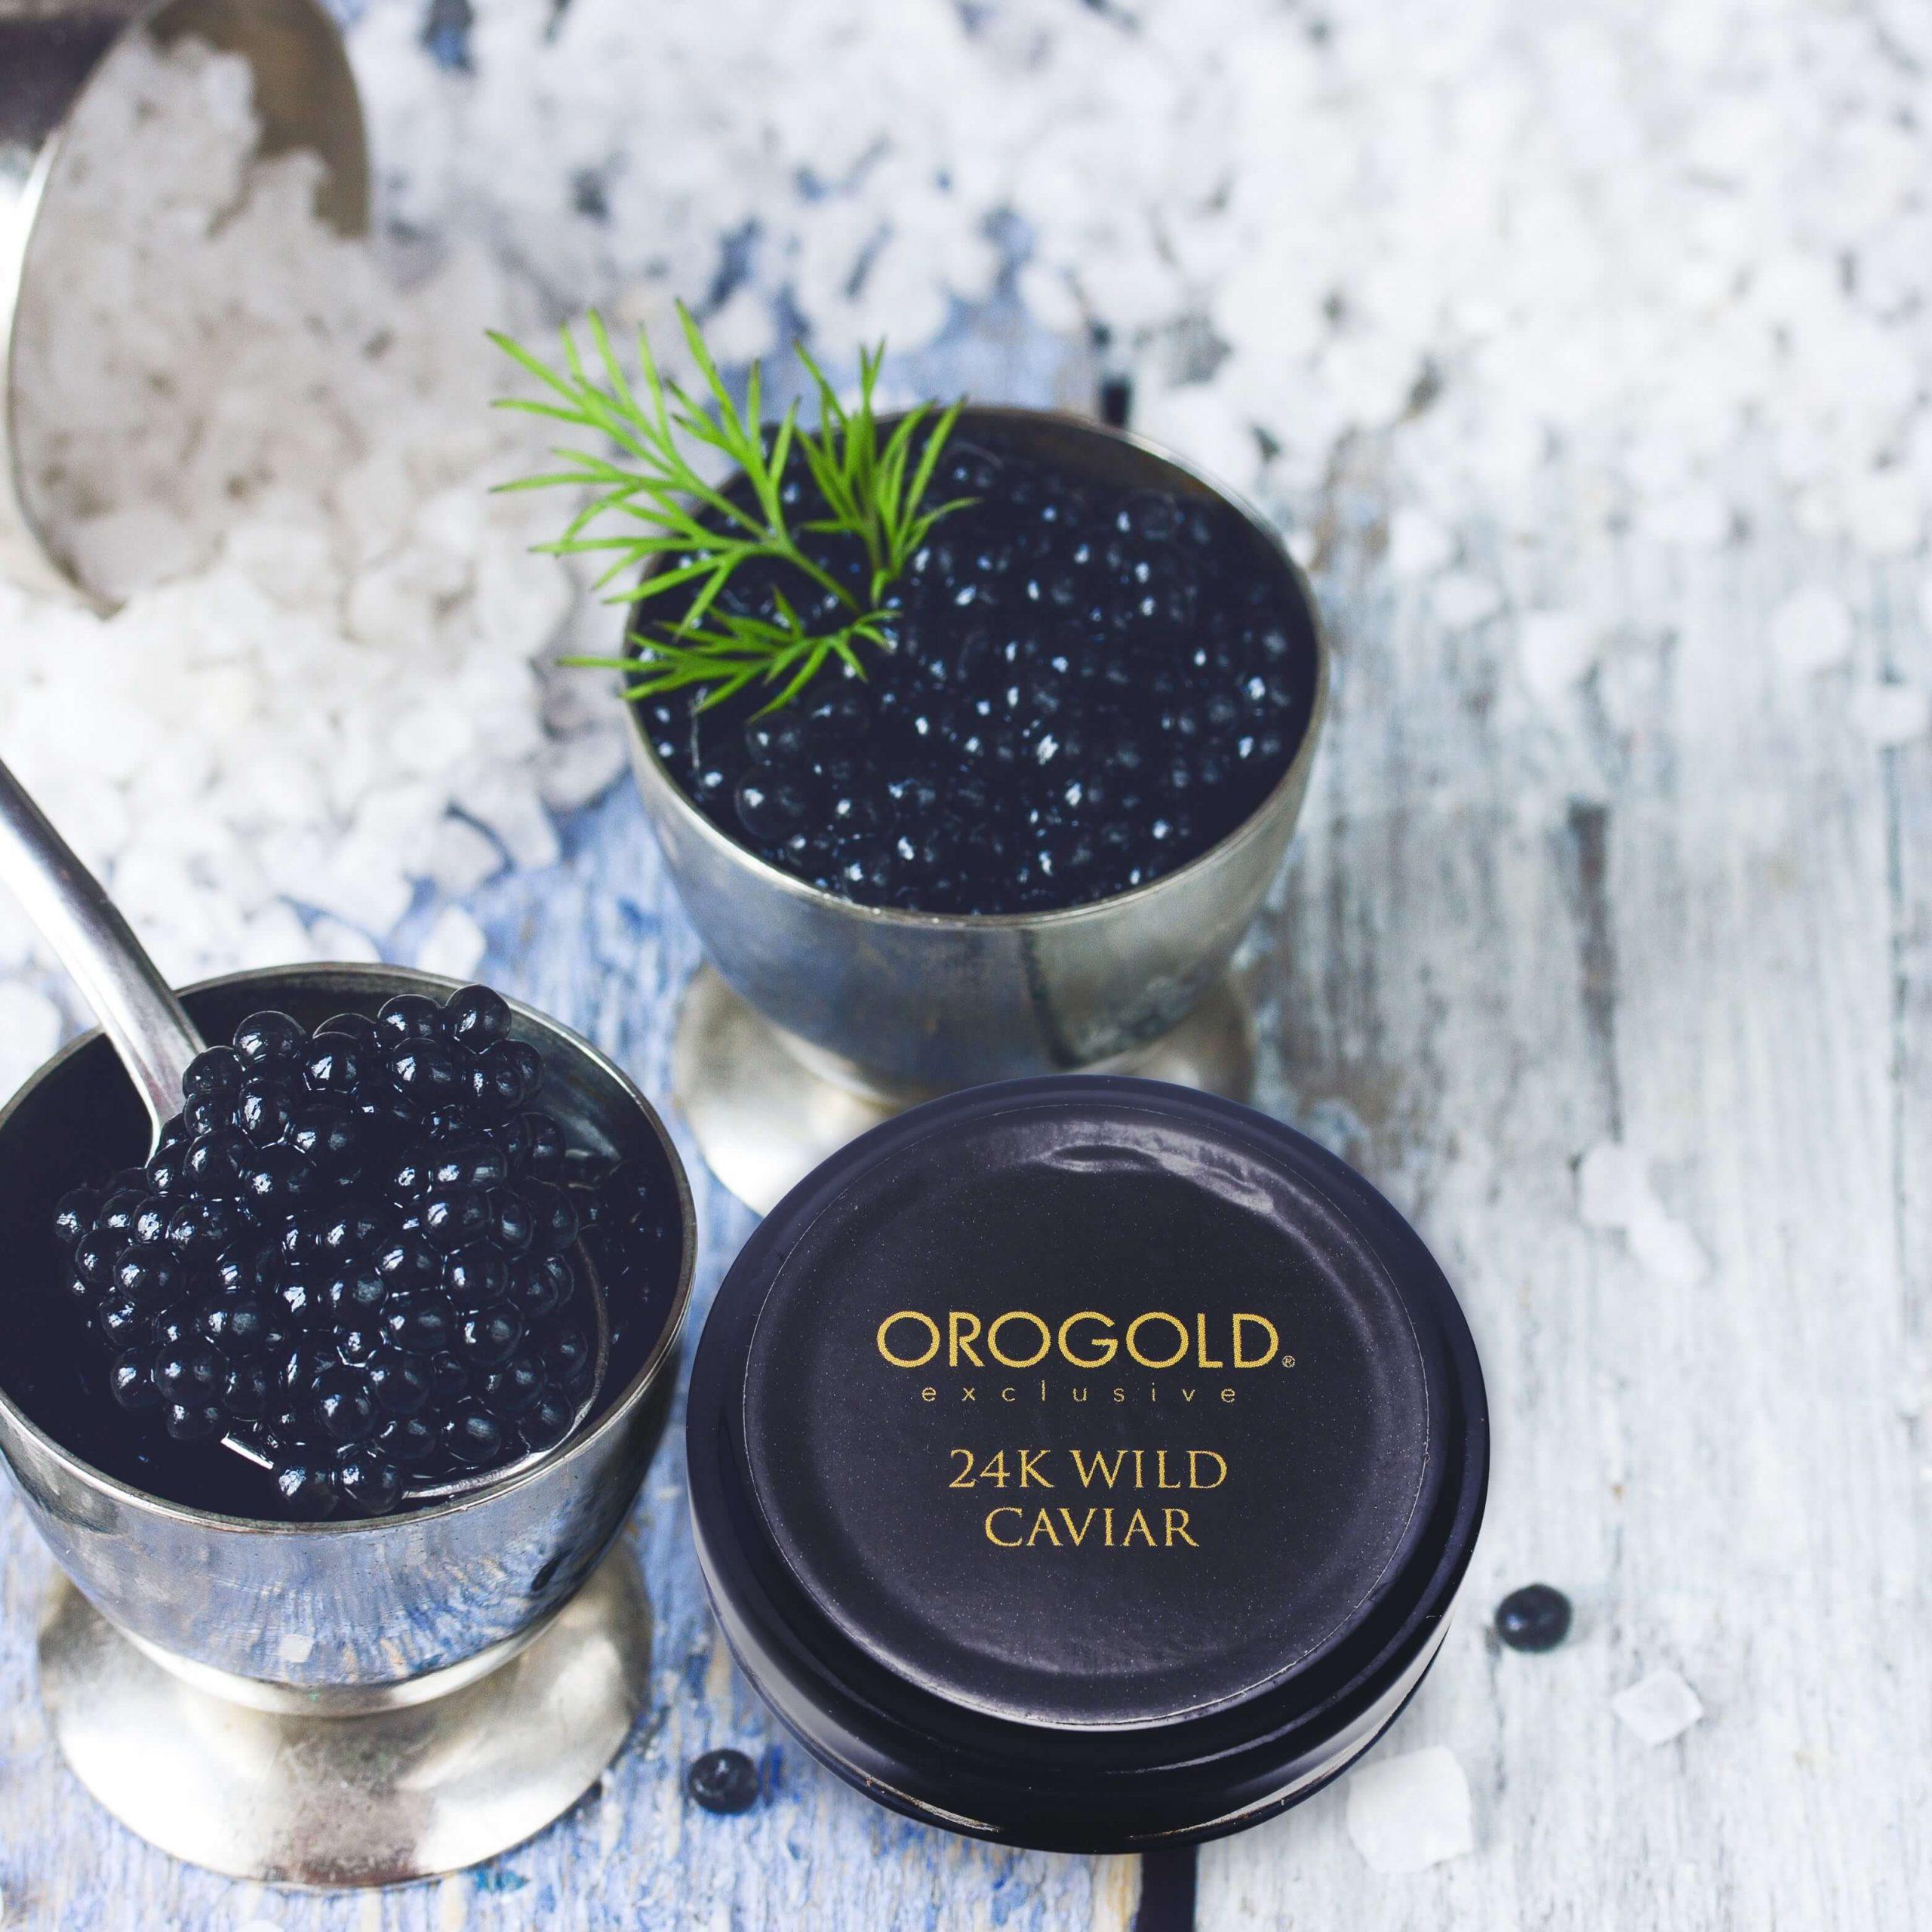 OROGOLD 24K Wild Caviar